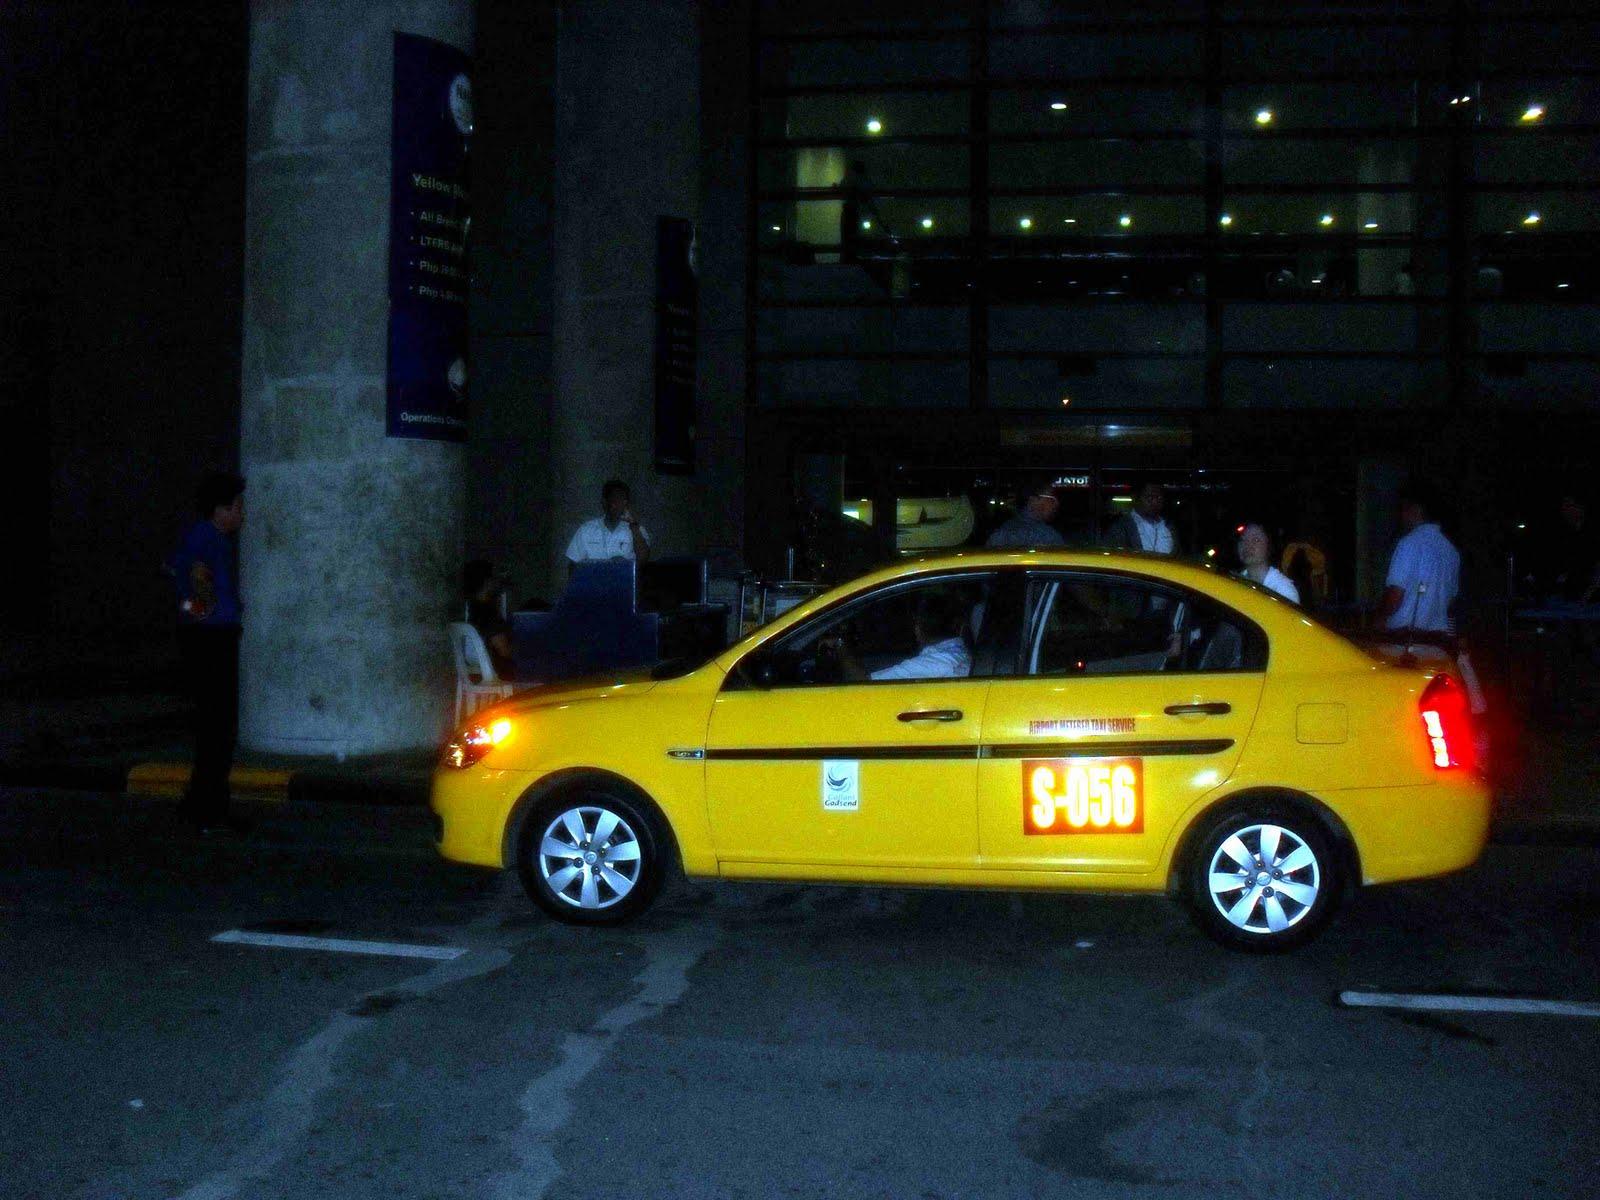 Taxi discount coupons